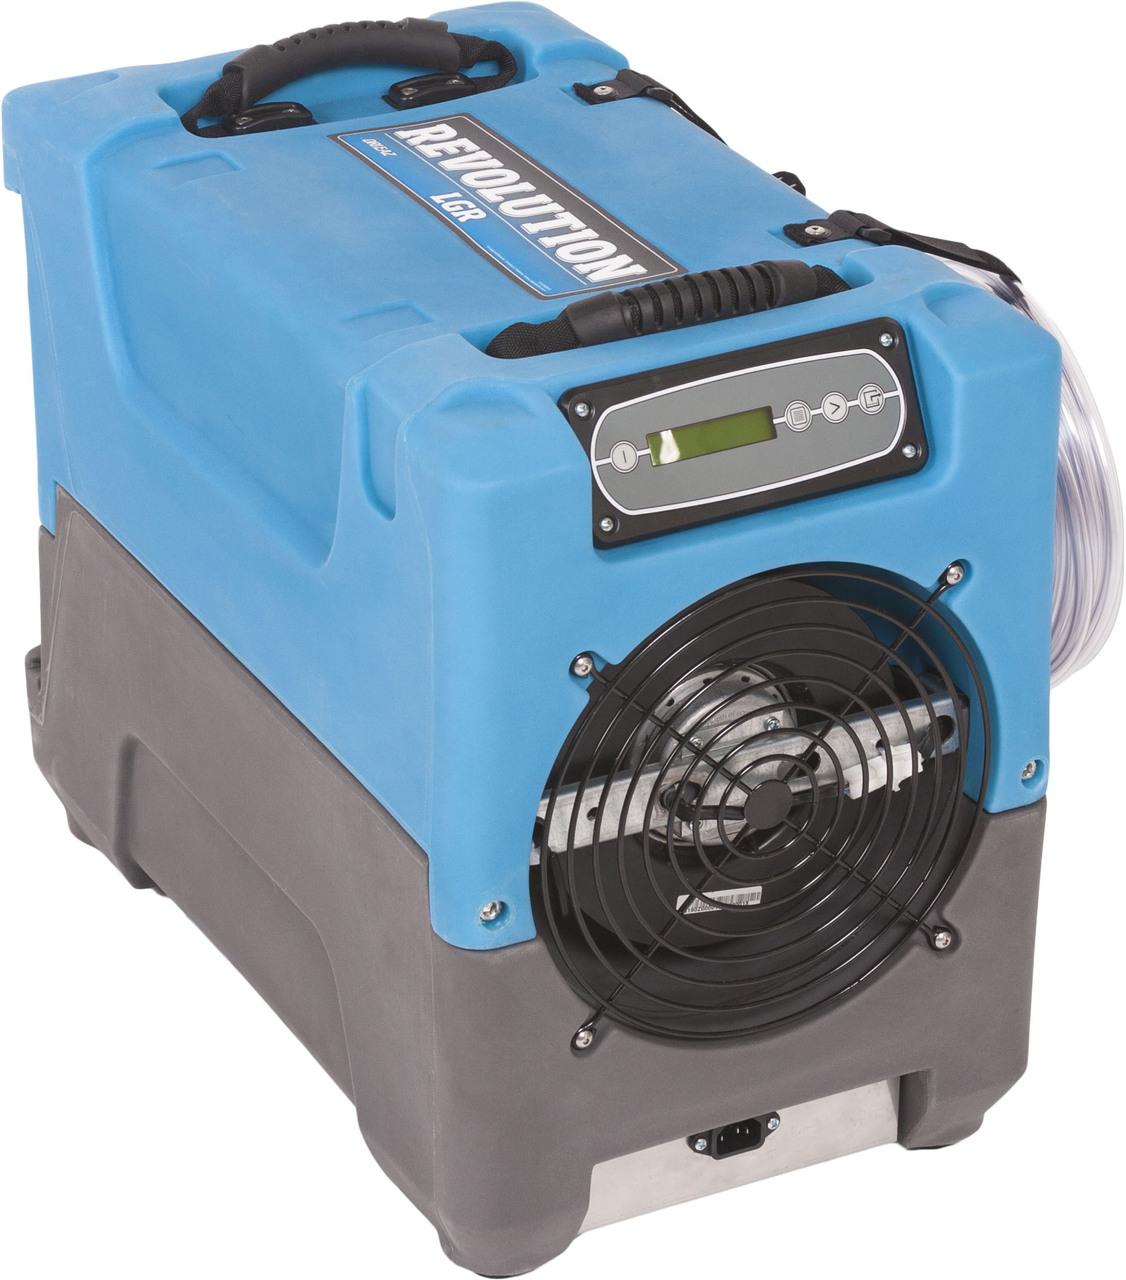 Dri Eaz Revolution Dehumidifier Dri Eaz F413 Amg